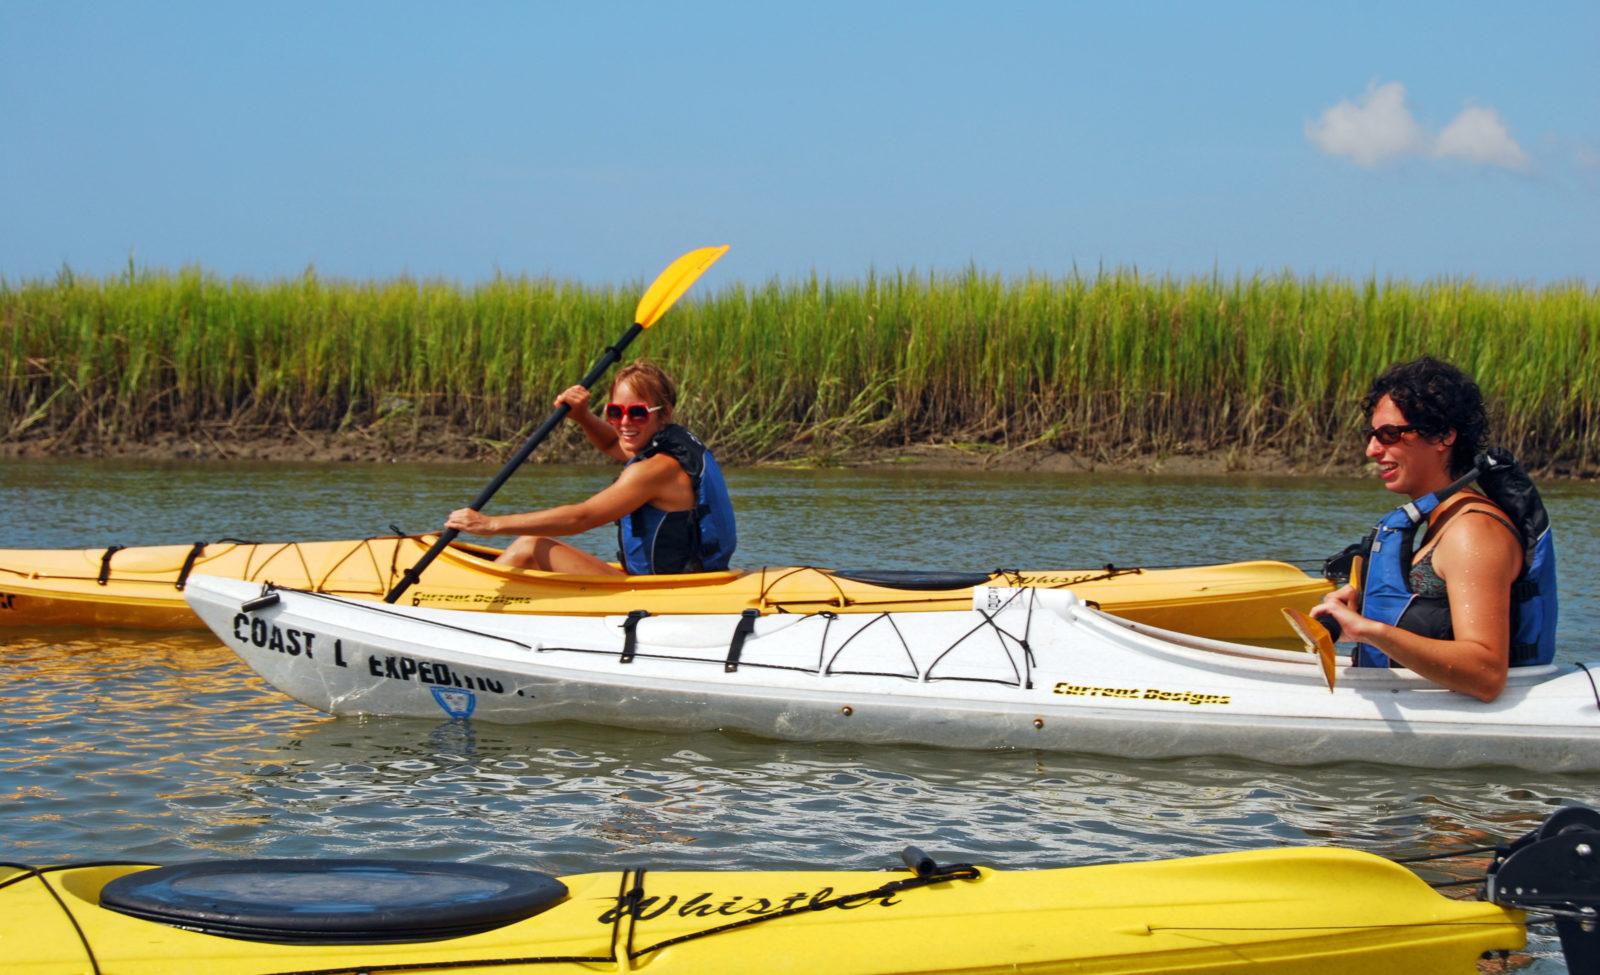 photo of paddlers in kayaks